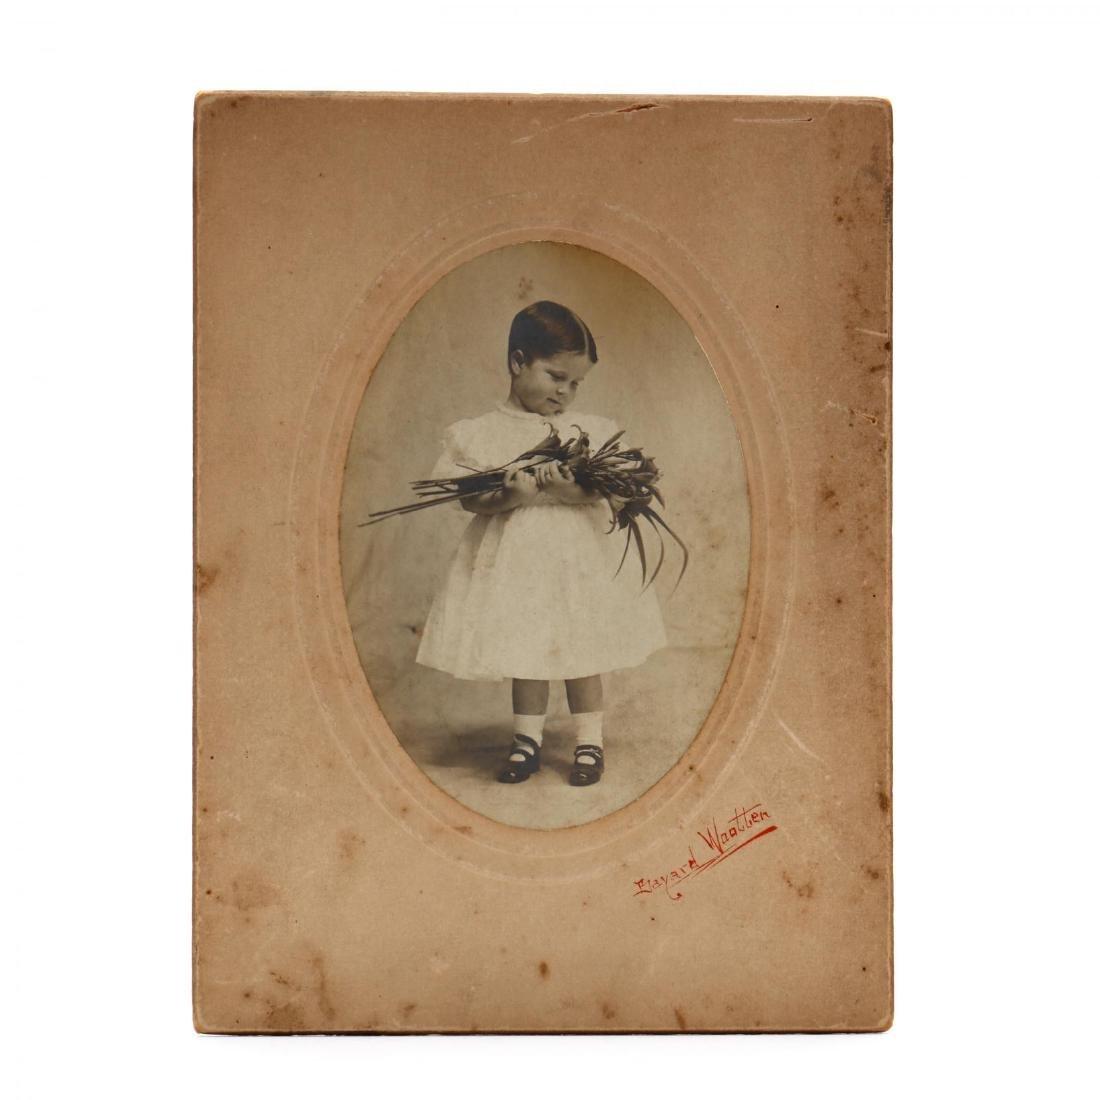 Bayard Wooten (NC, 1875-1959), Portrait of a Child